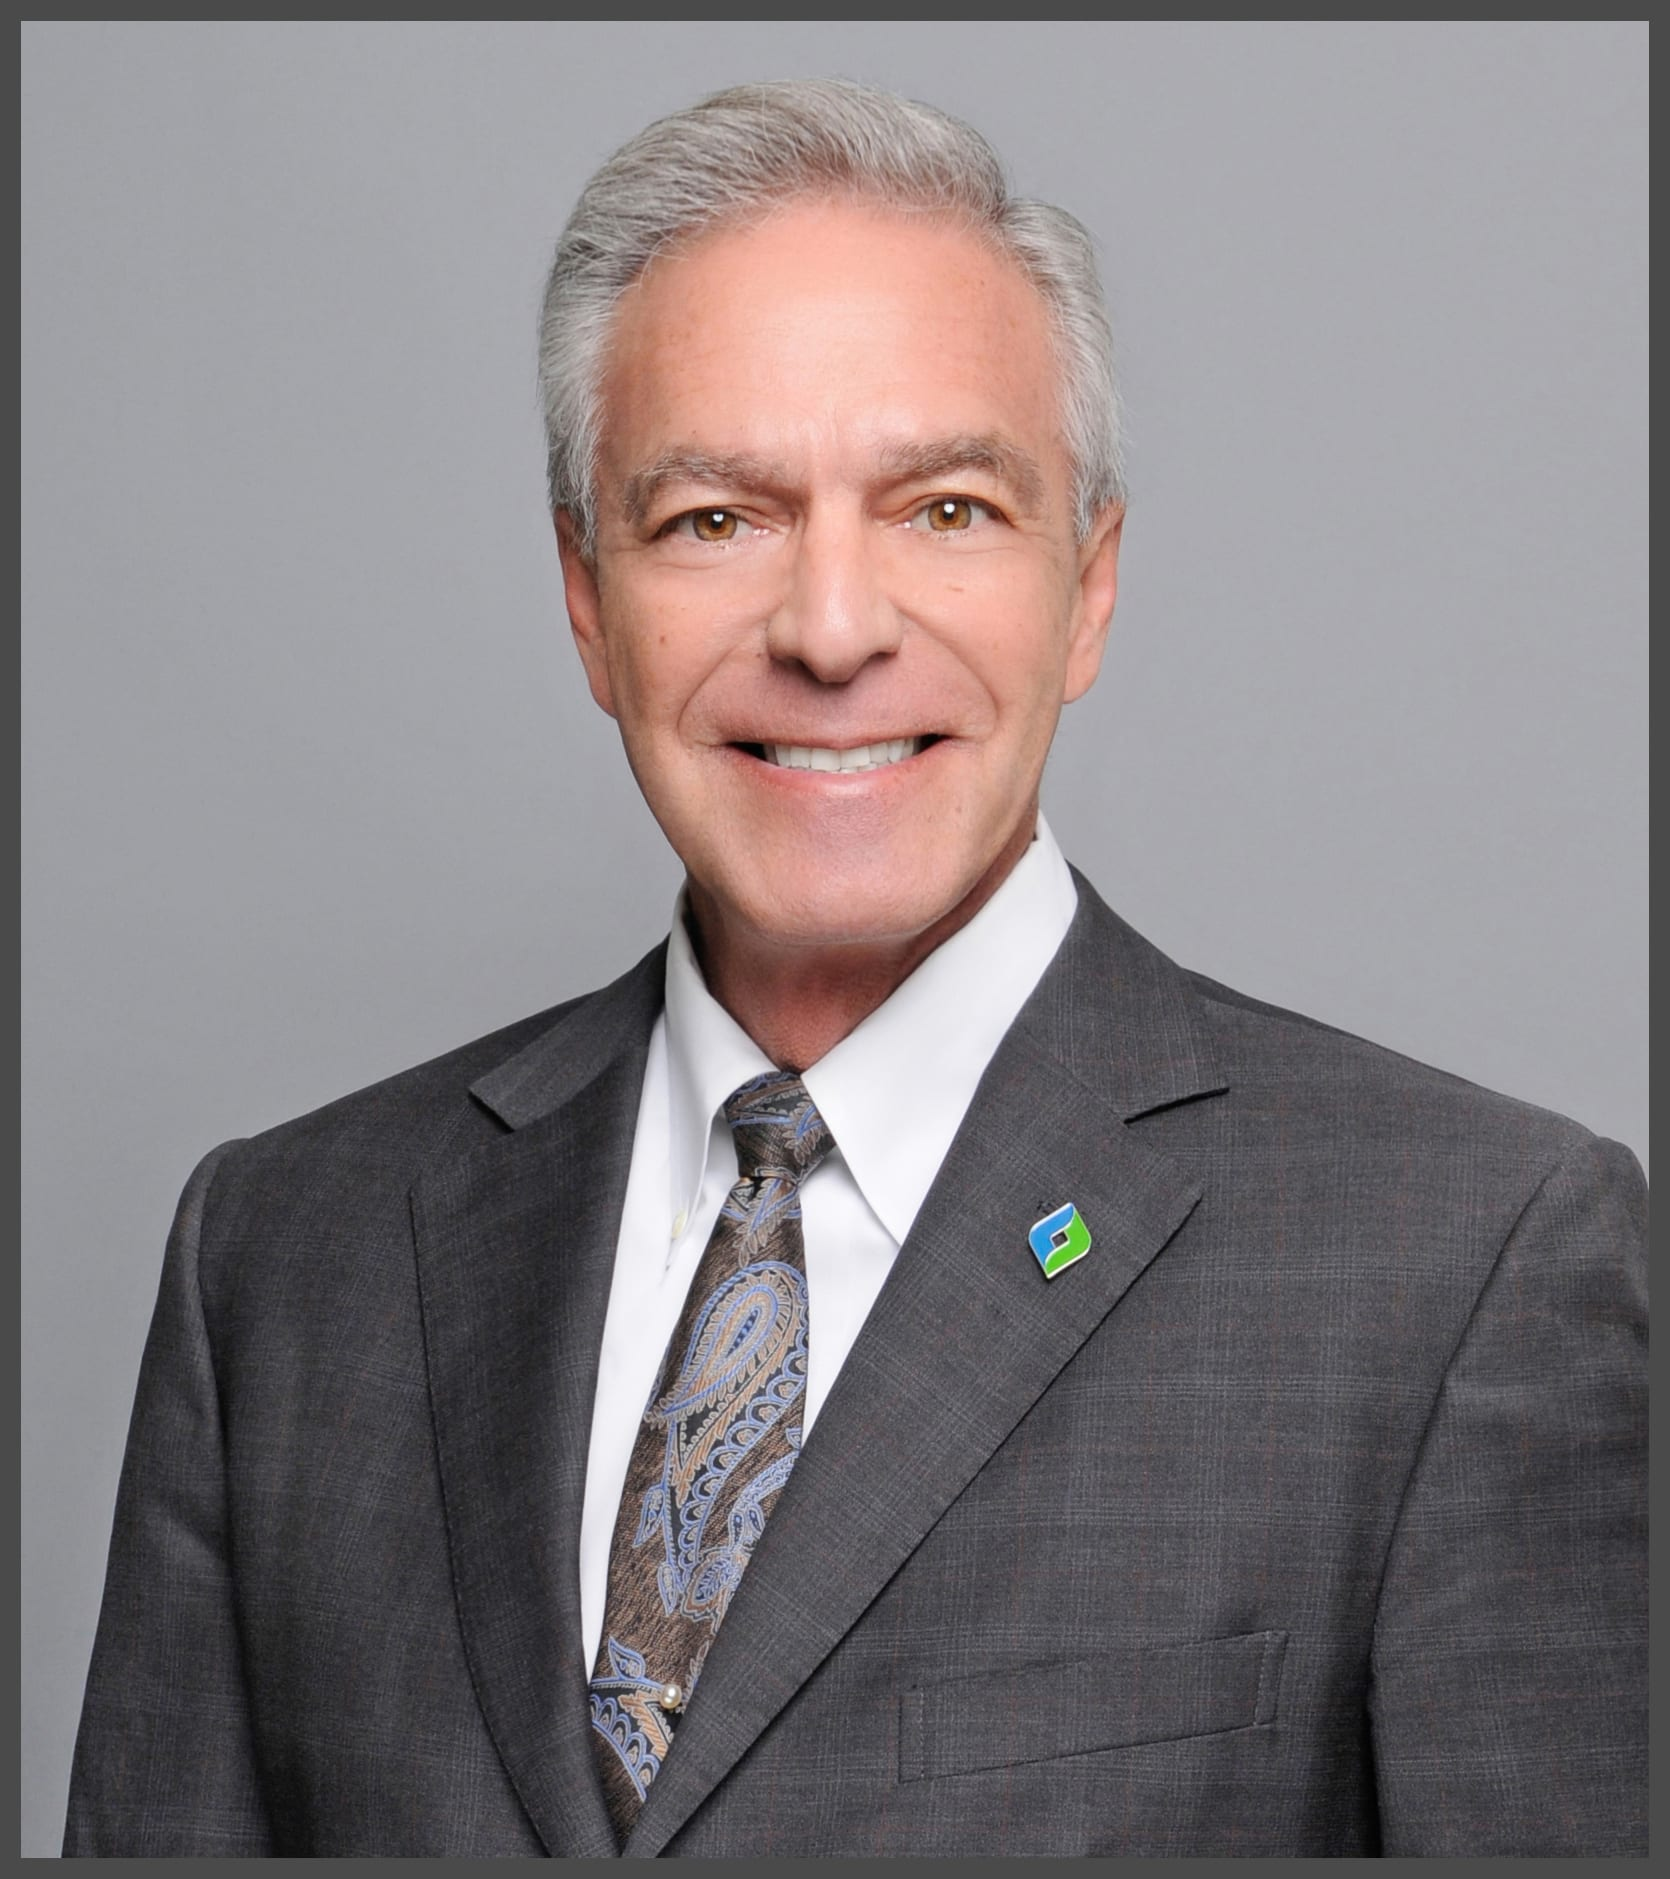 Dr. Richard Aguilar